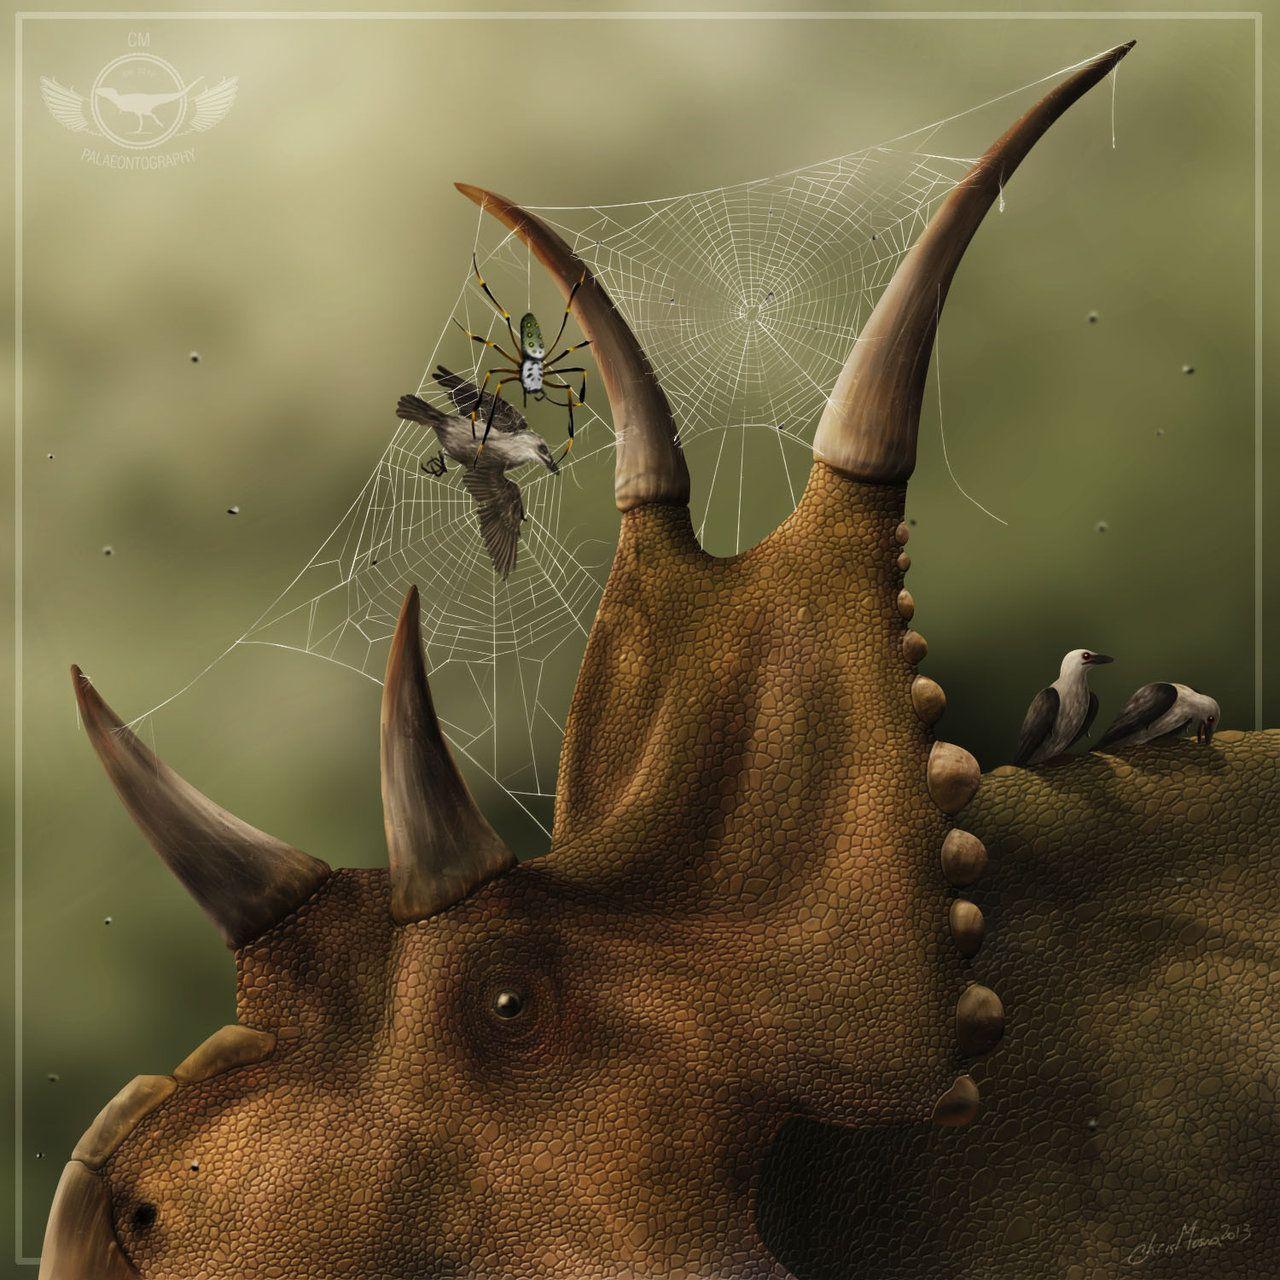 animal symbiosis - photo #34